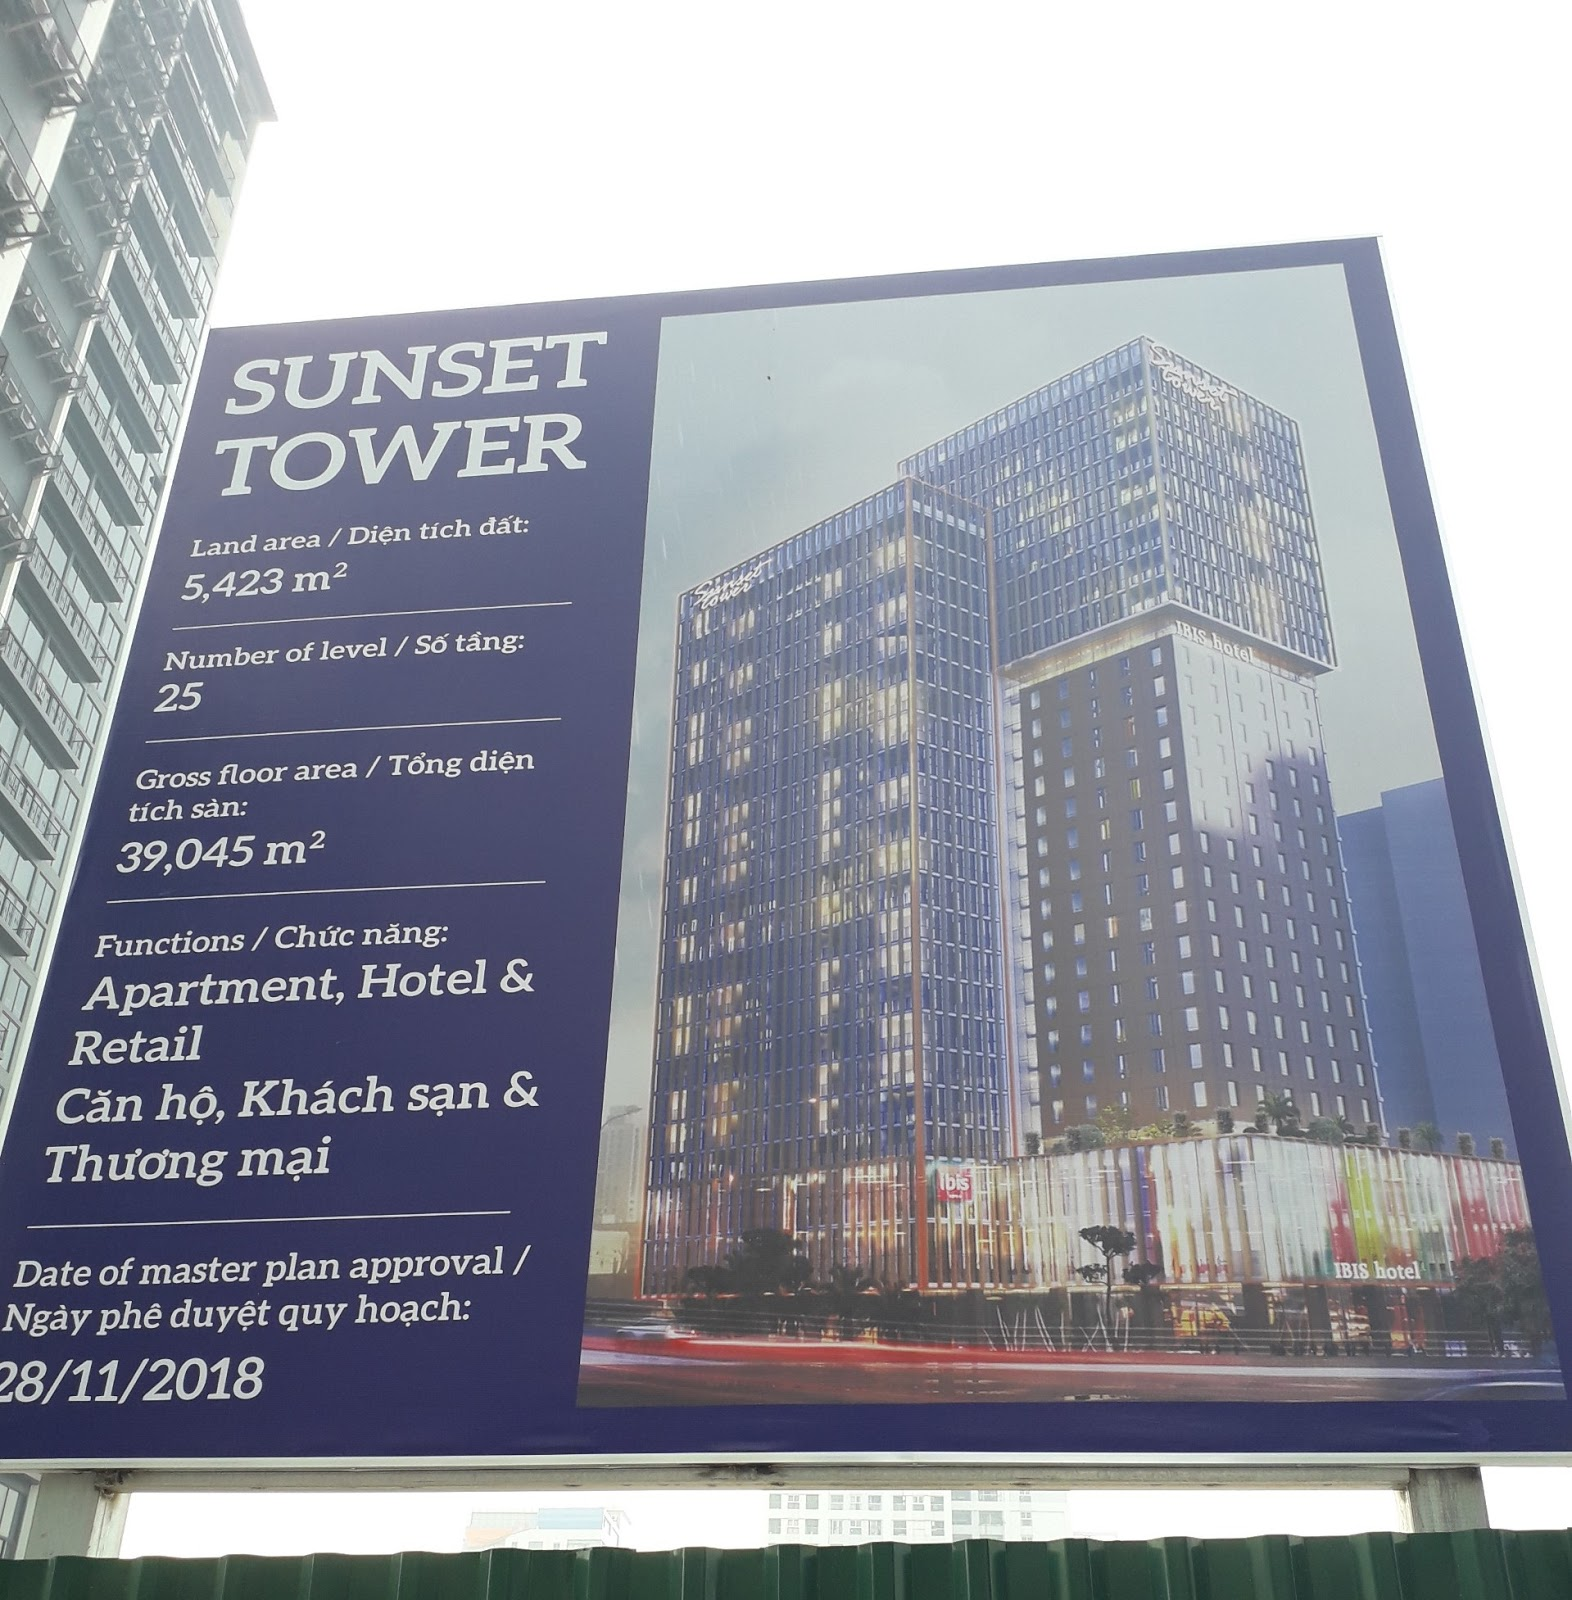 Dự án Sunset Tower Tây Hồ.